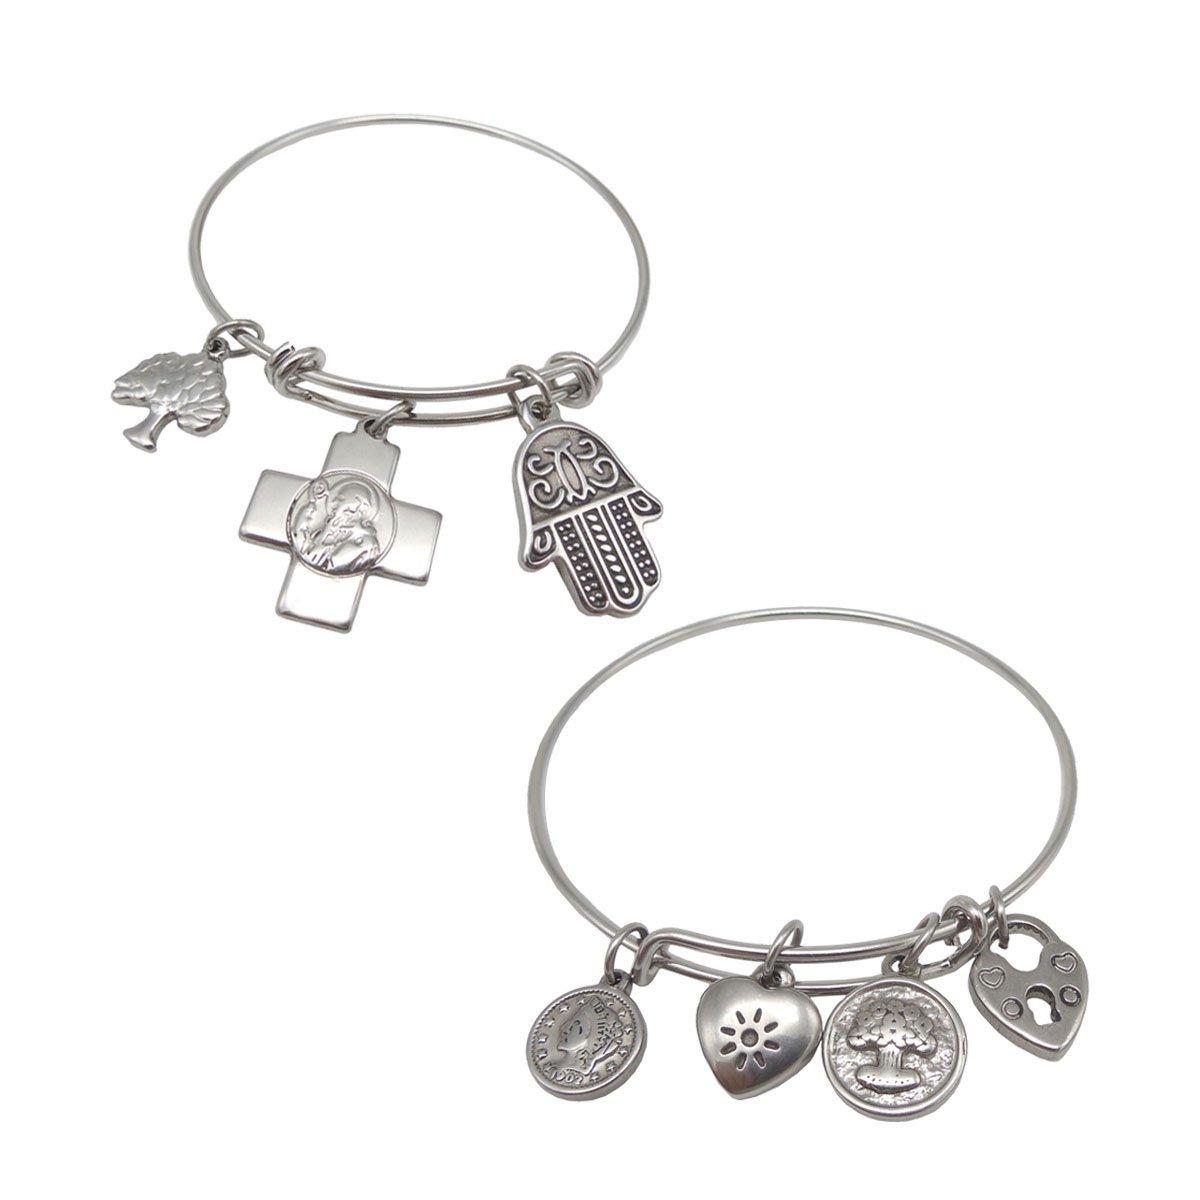 NewStar Girls Religious Bracelet Women Bangle Expandable Wire Bracelets DIY Jewelry Gifts Set - 2 Pack